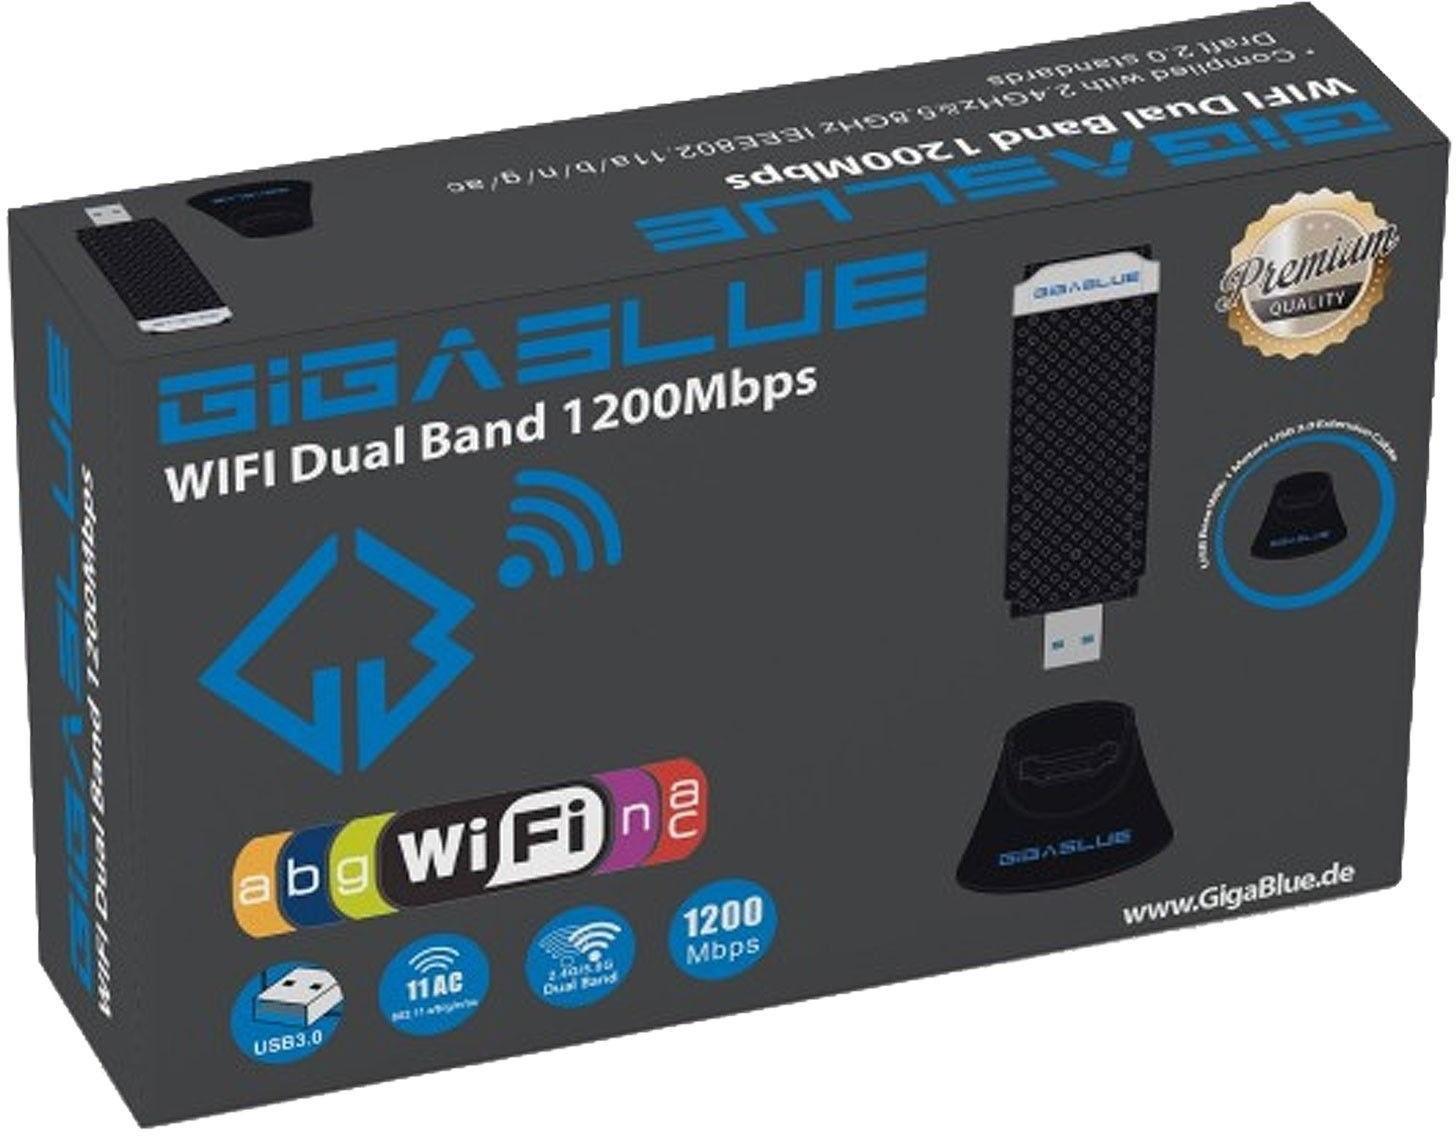 Image of GigaBlue 1200 Mbit WLAN Dual Band USB 3.0